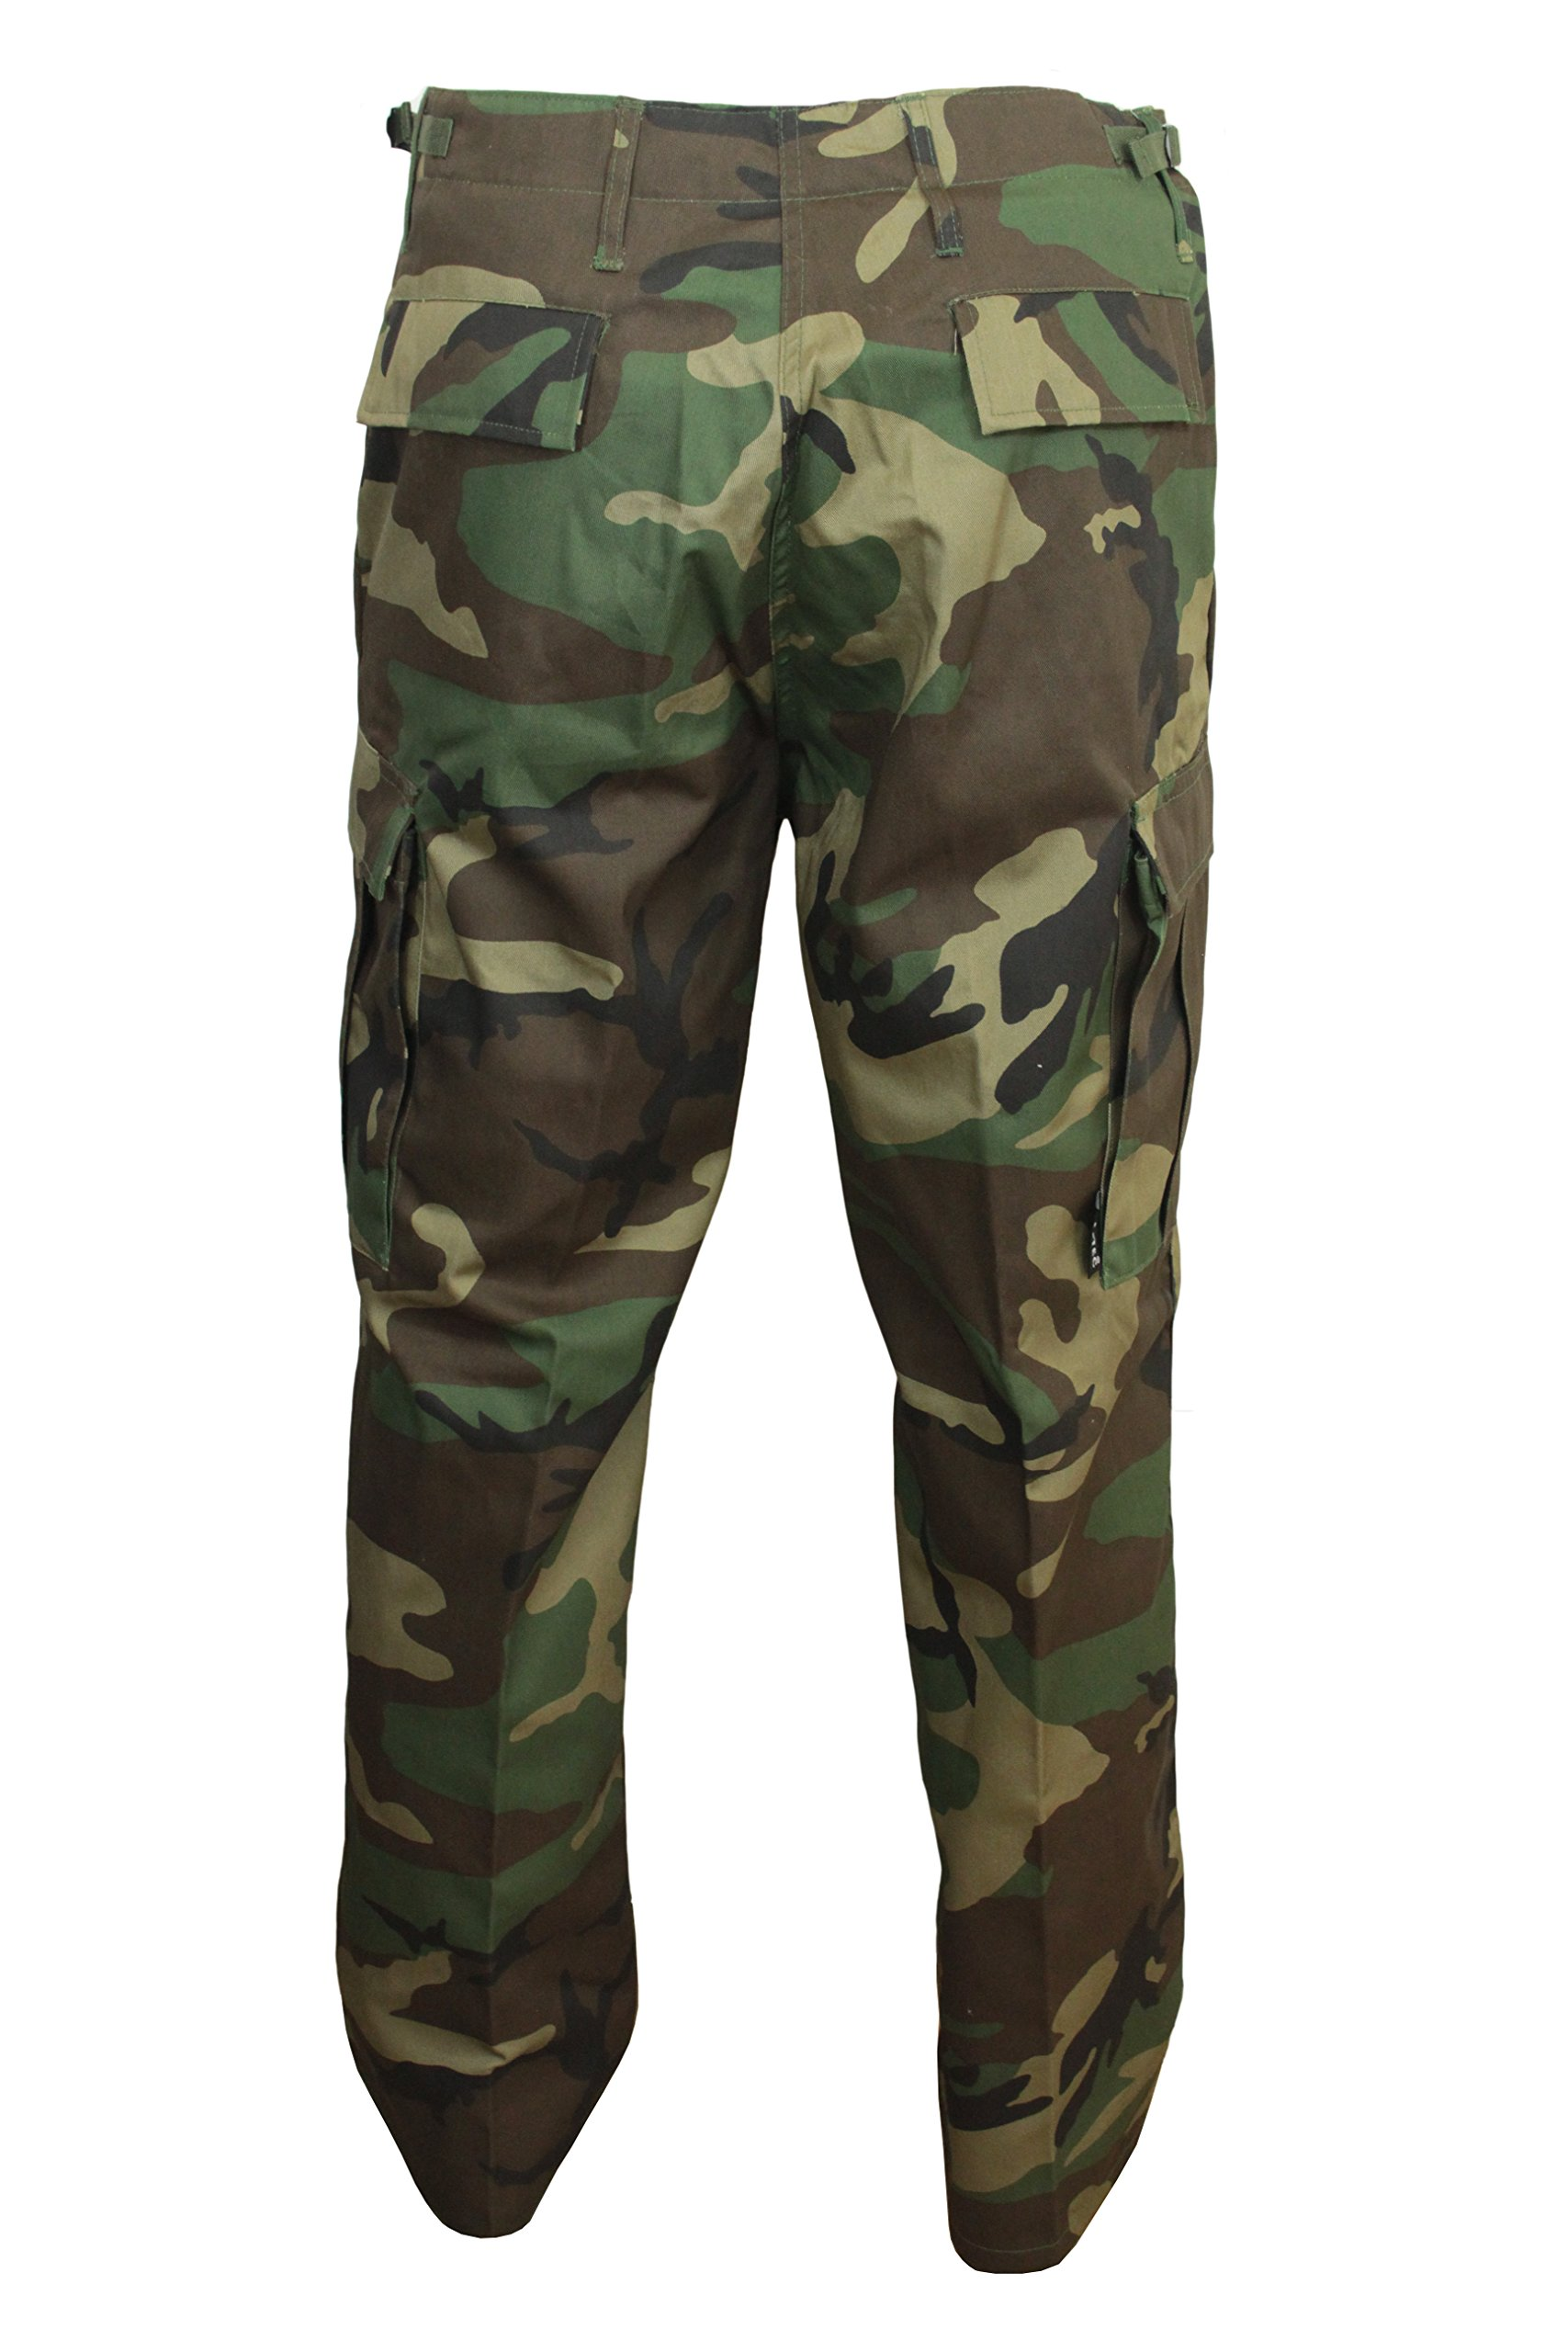 ad9a0f0b79d6a Mil-Tec Us Ranger Hose Typ BDU Pantalon armée Homme